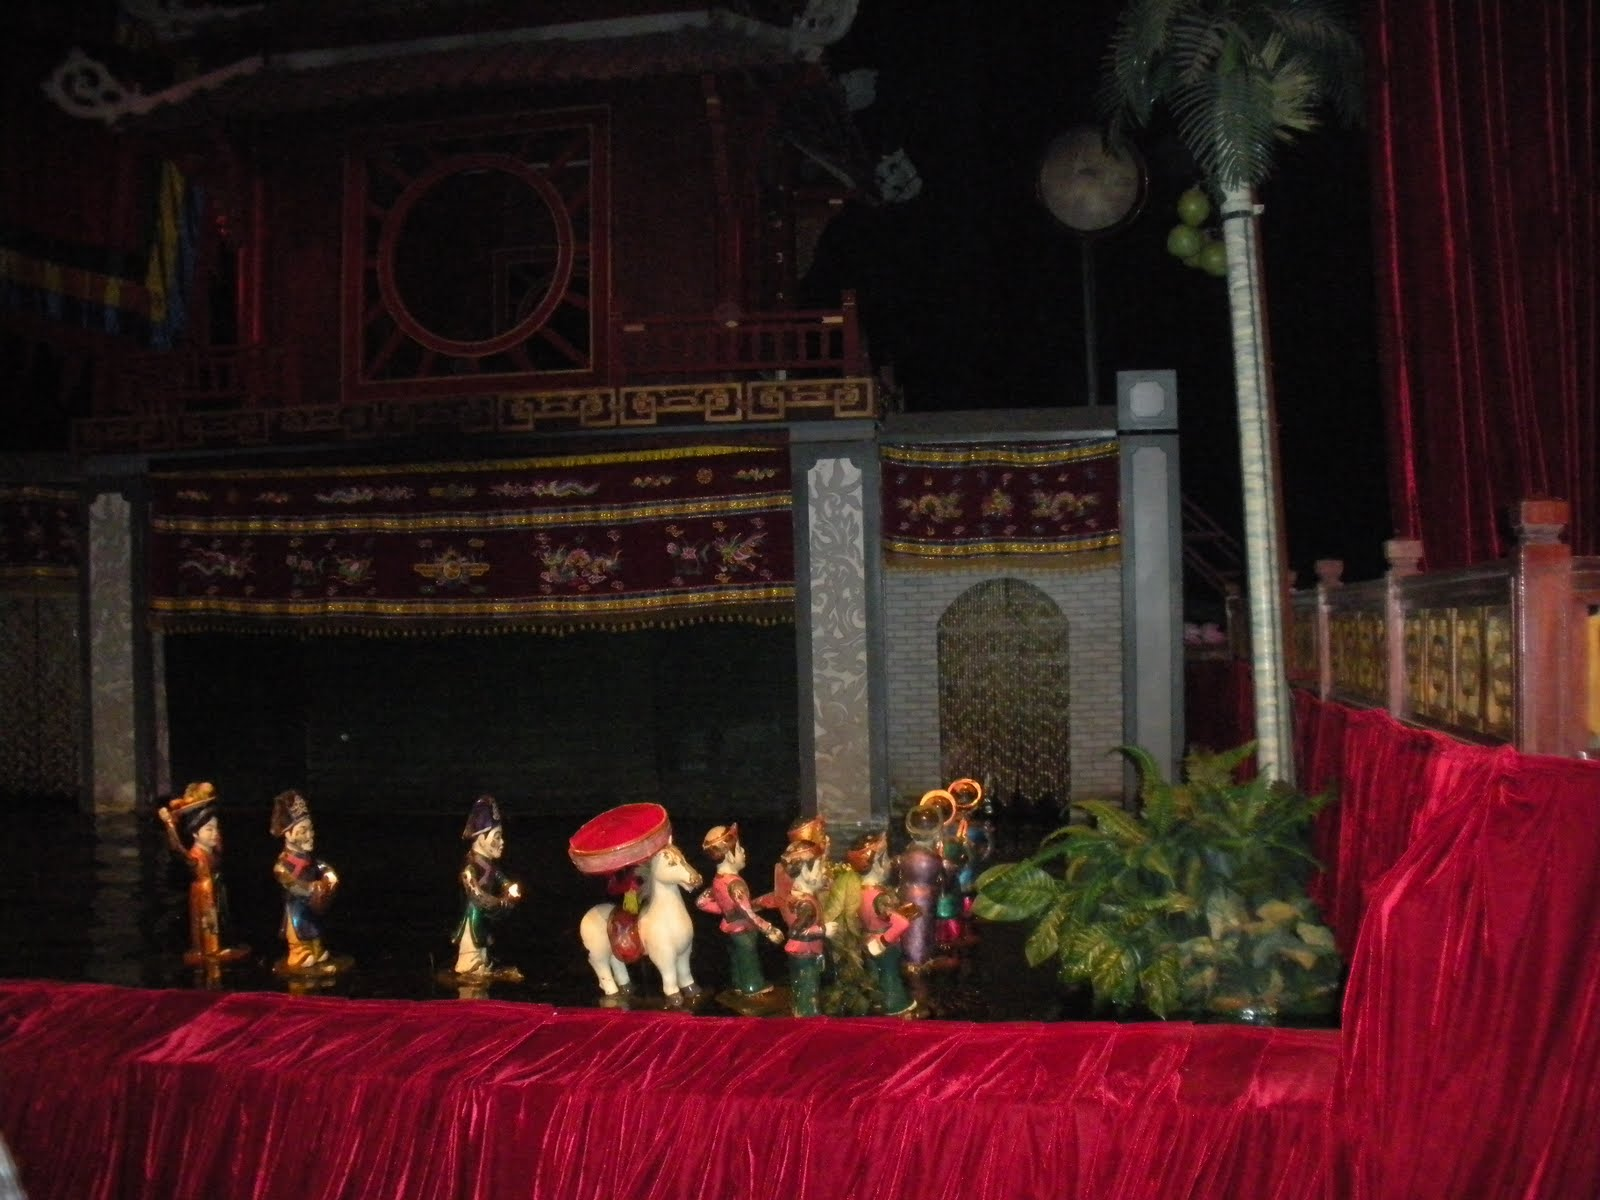 Teatro de marionetas de agua de Hanoi  Vietnam